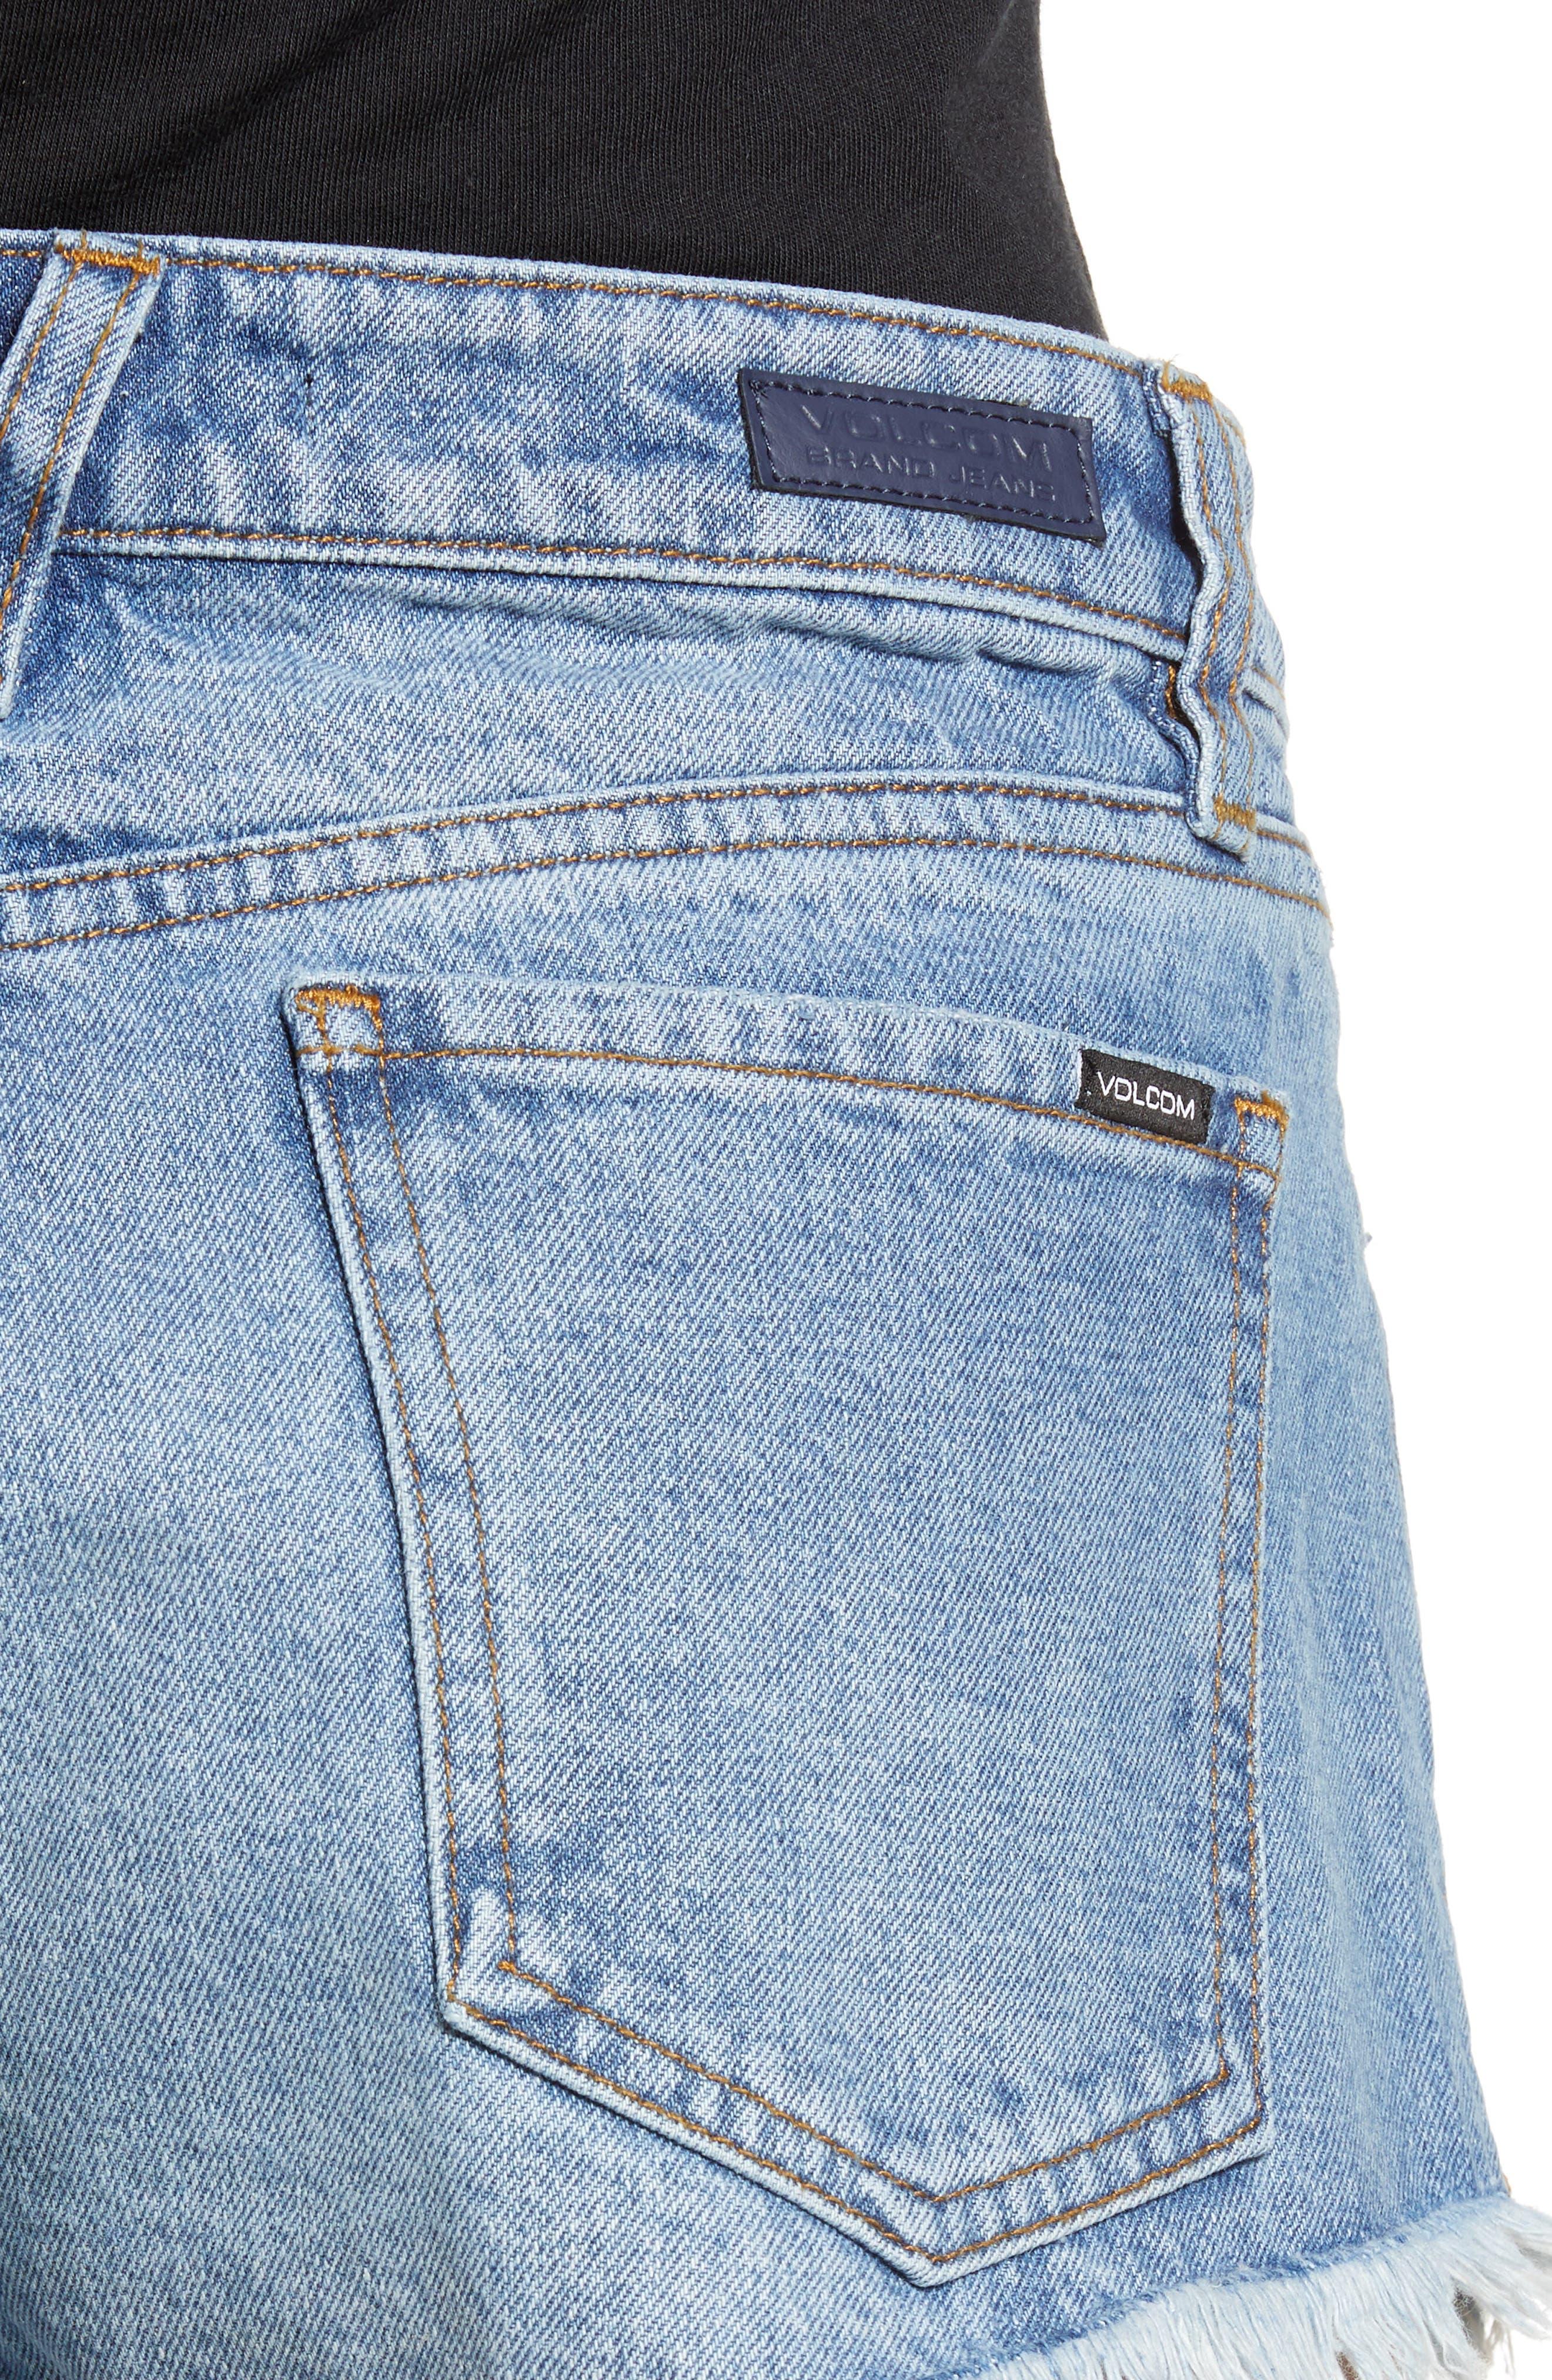 Stoney Cutoff Denim Shorts,                             Alternate thumbnail 4, color,                             Baja Indigo